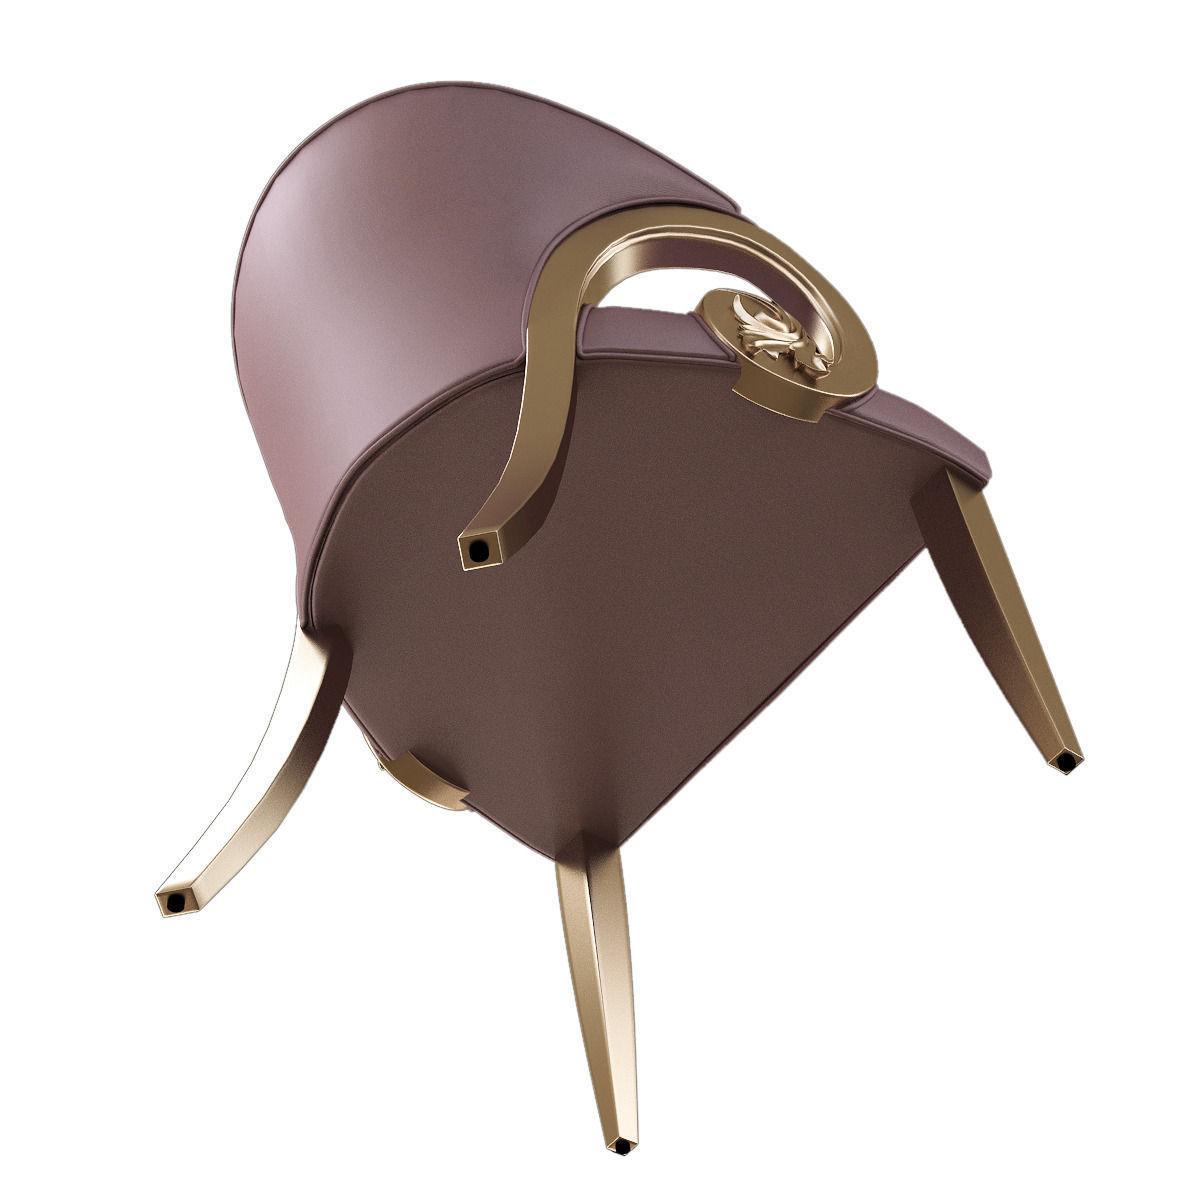 Christopher Guy Furniture Christopher Guy Boutique Chair 3d Model Max Obj 3ds Fbx Mtl